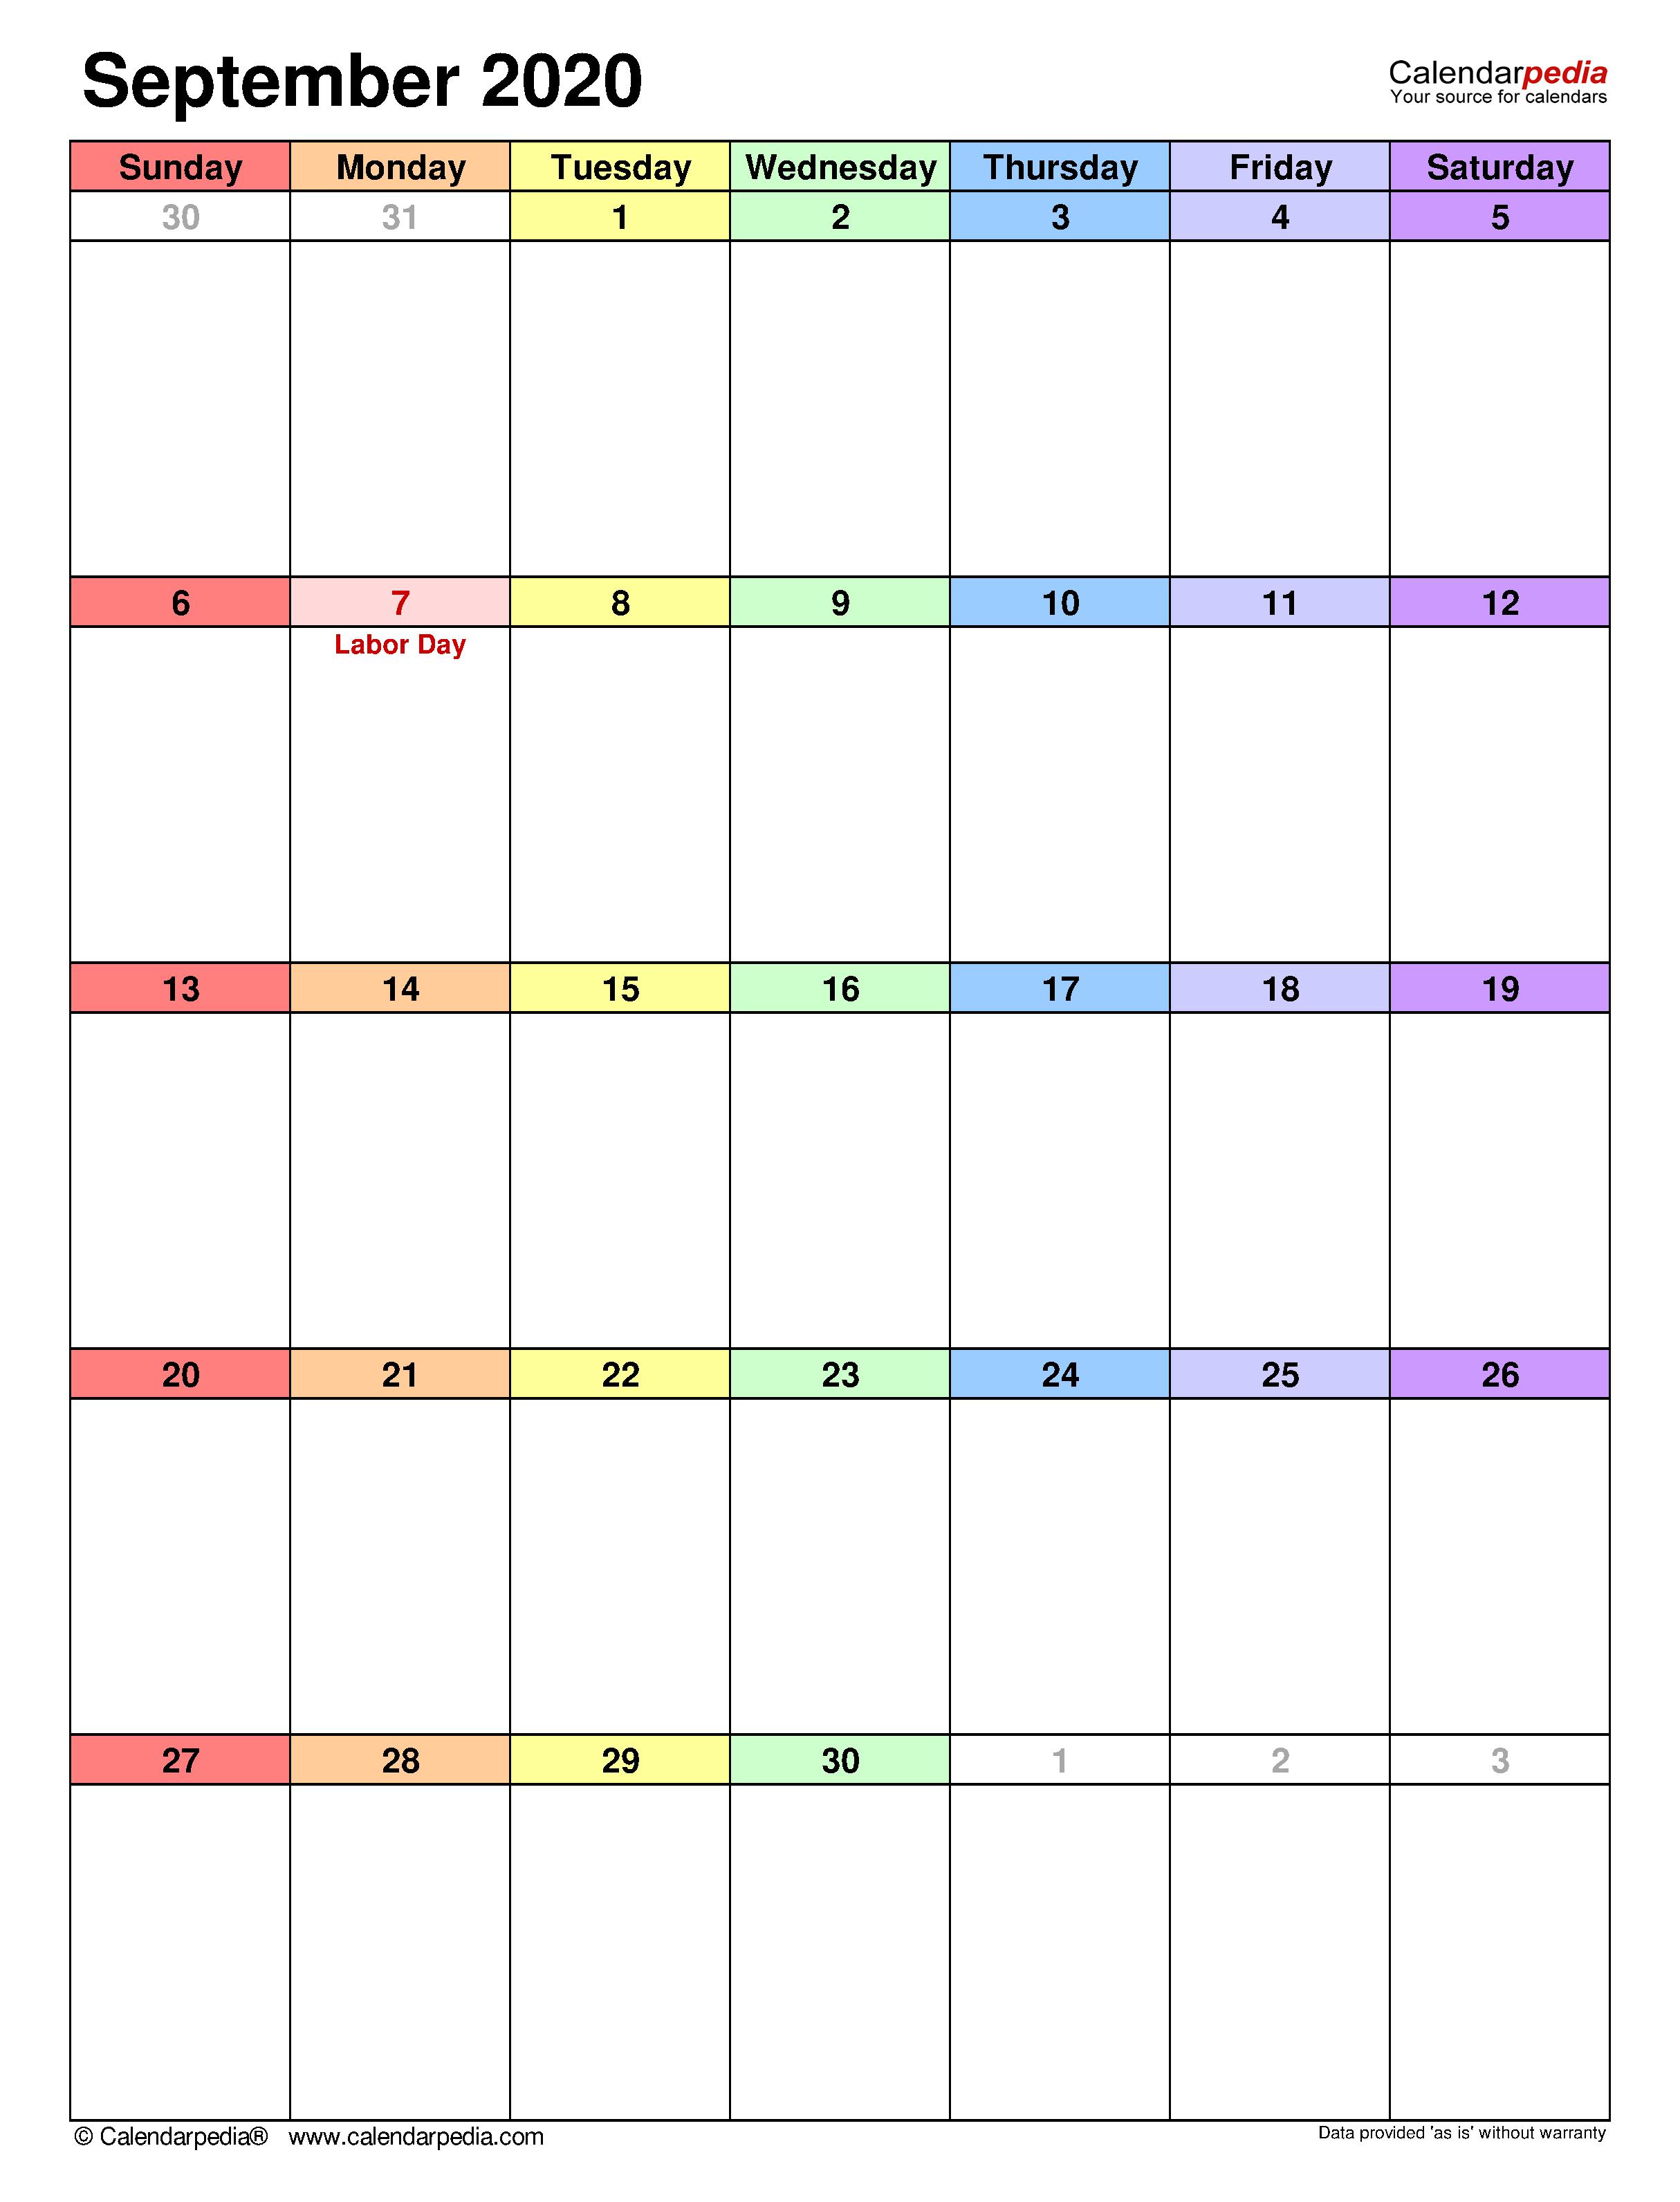 September 2020 - Calendar Templates For Word, Excel And Pdf regarding September Fill In Calendar 2020